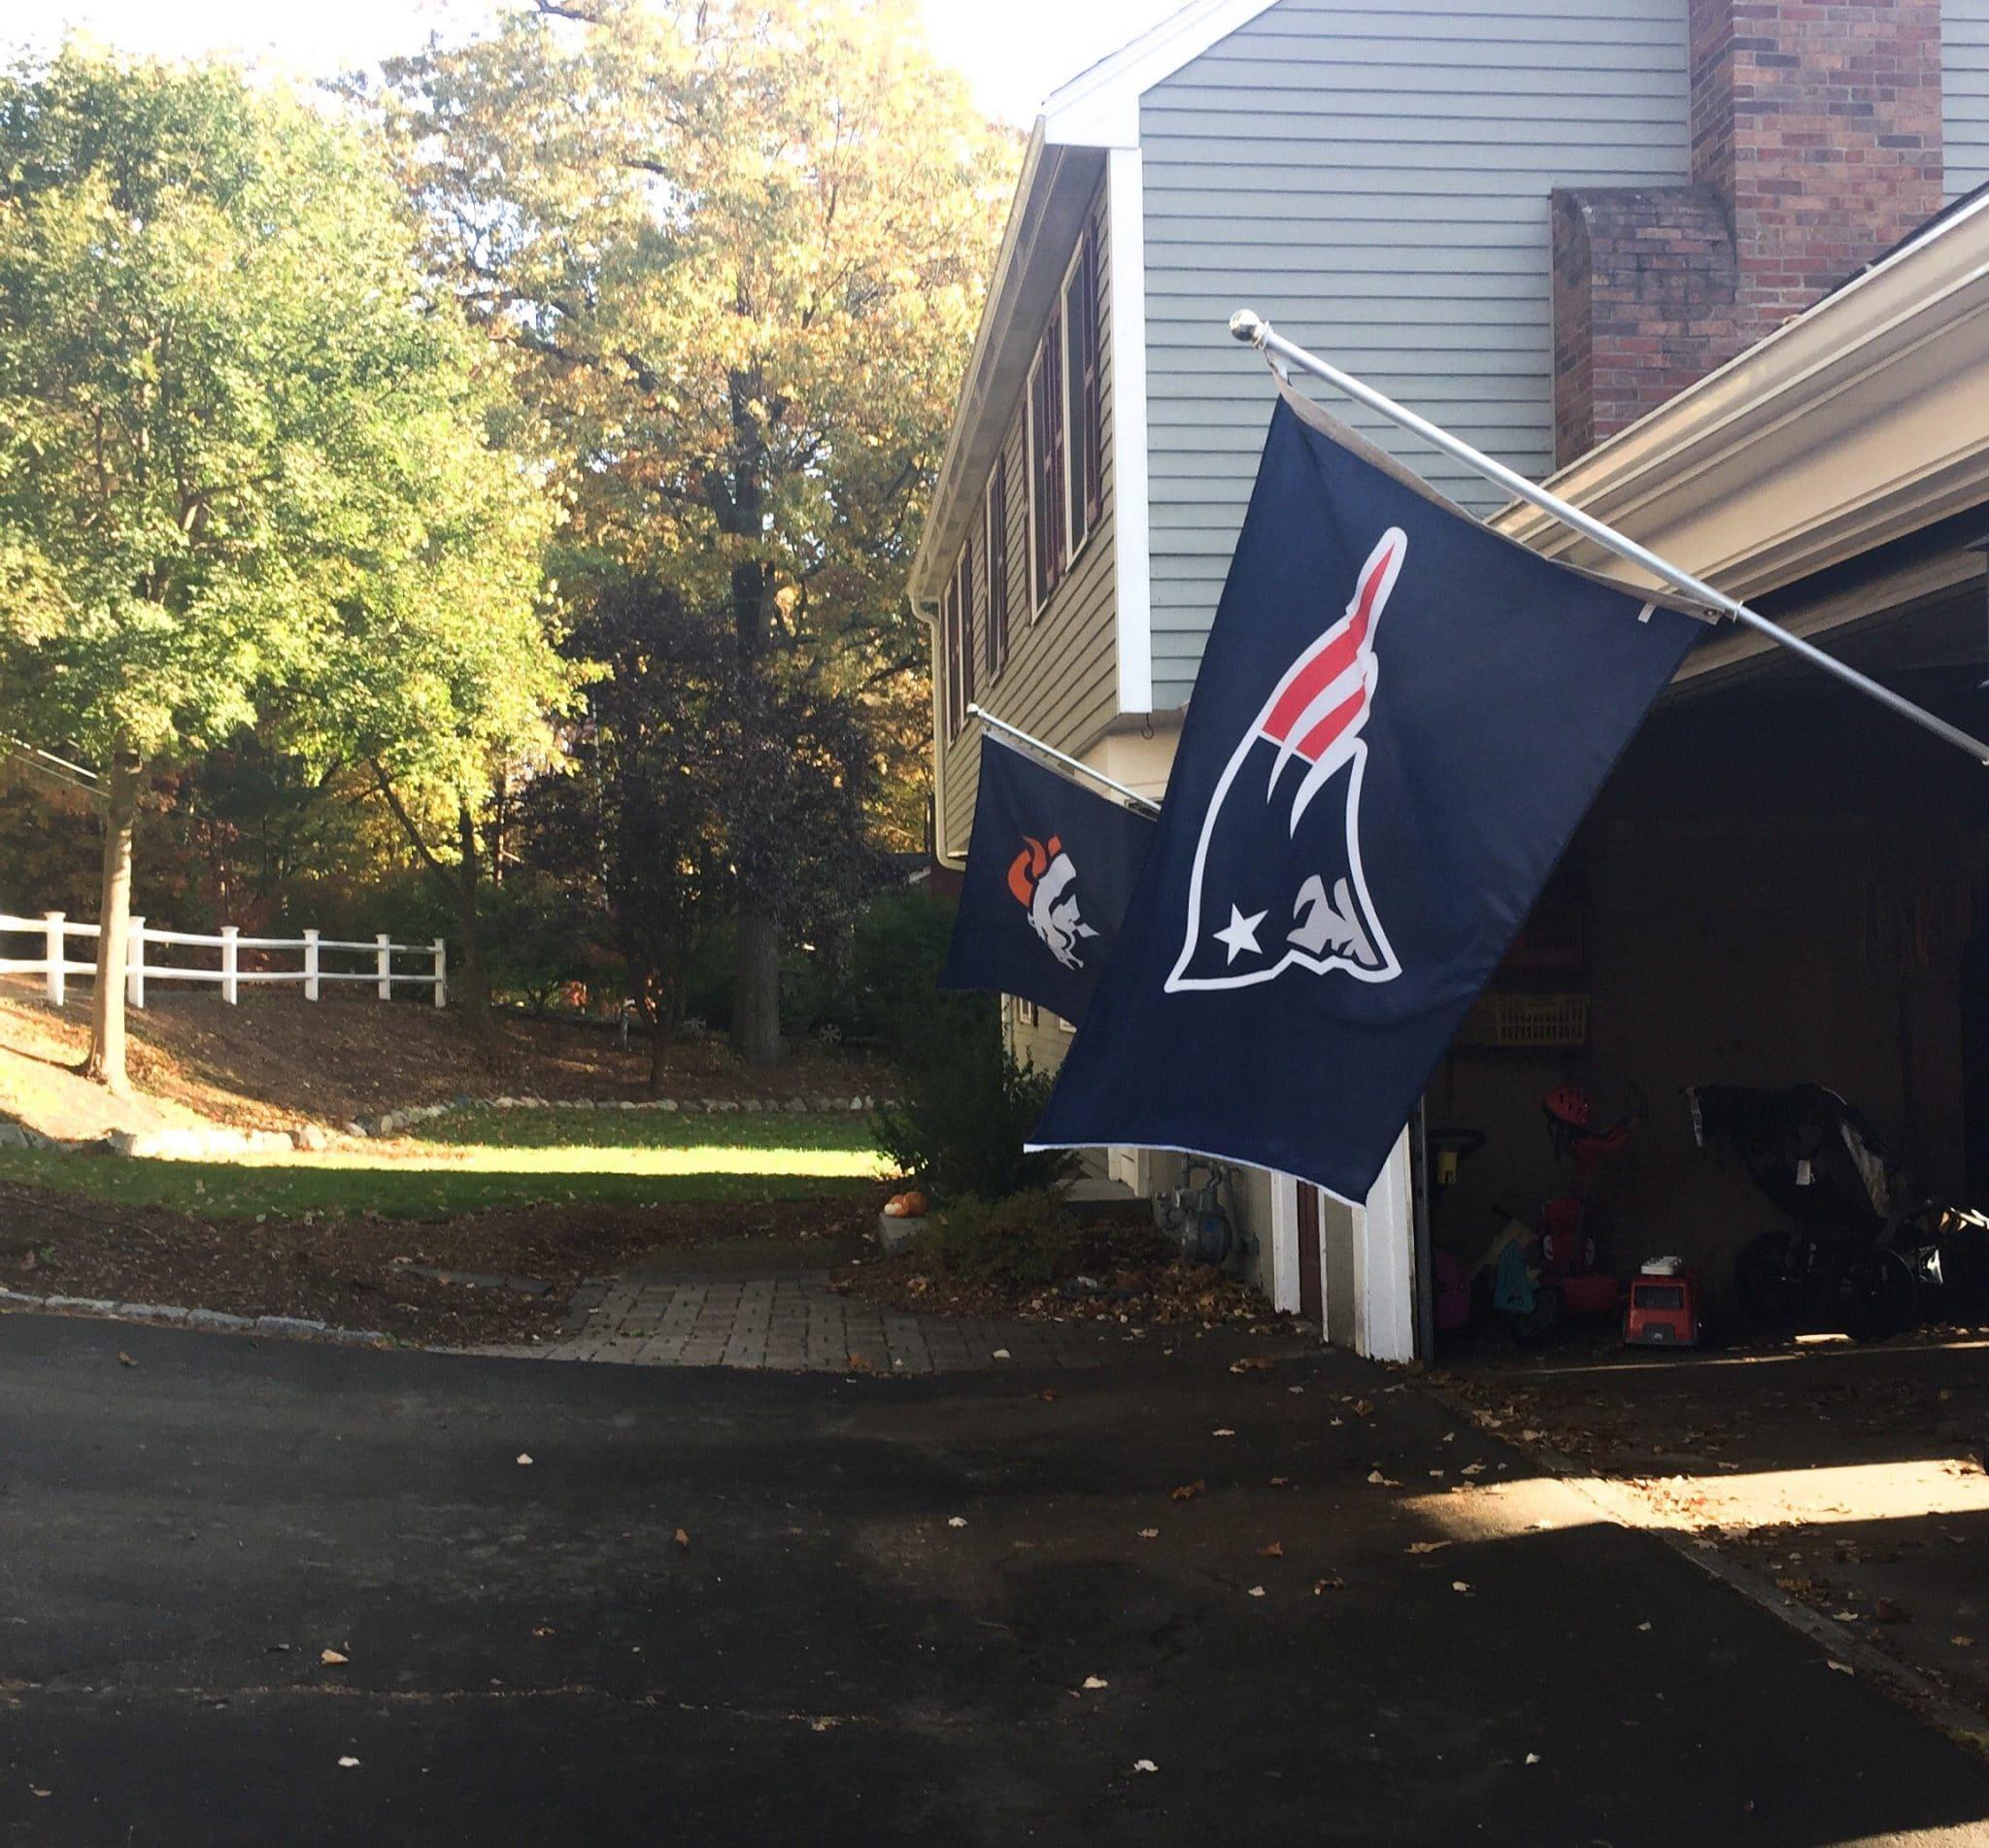 NFL team flags